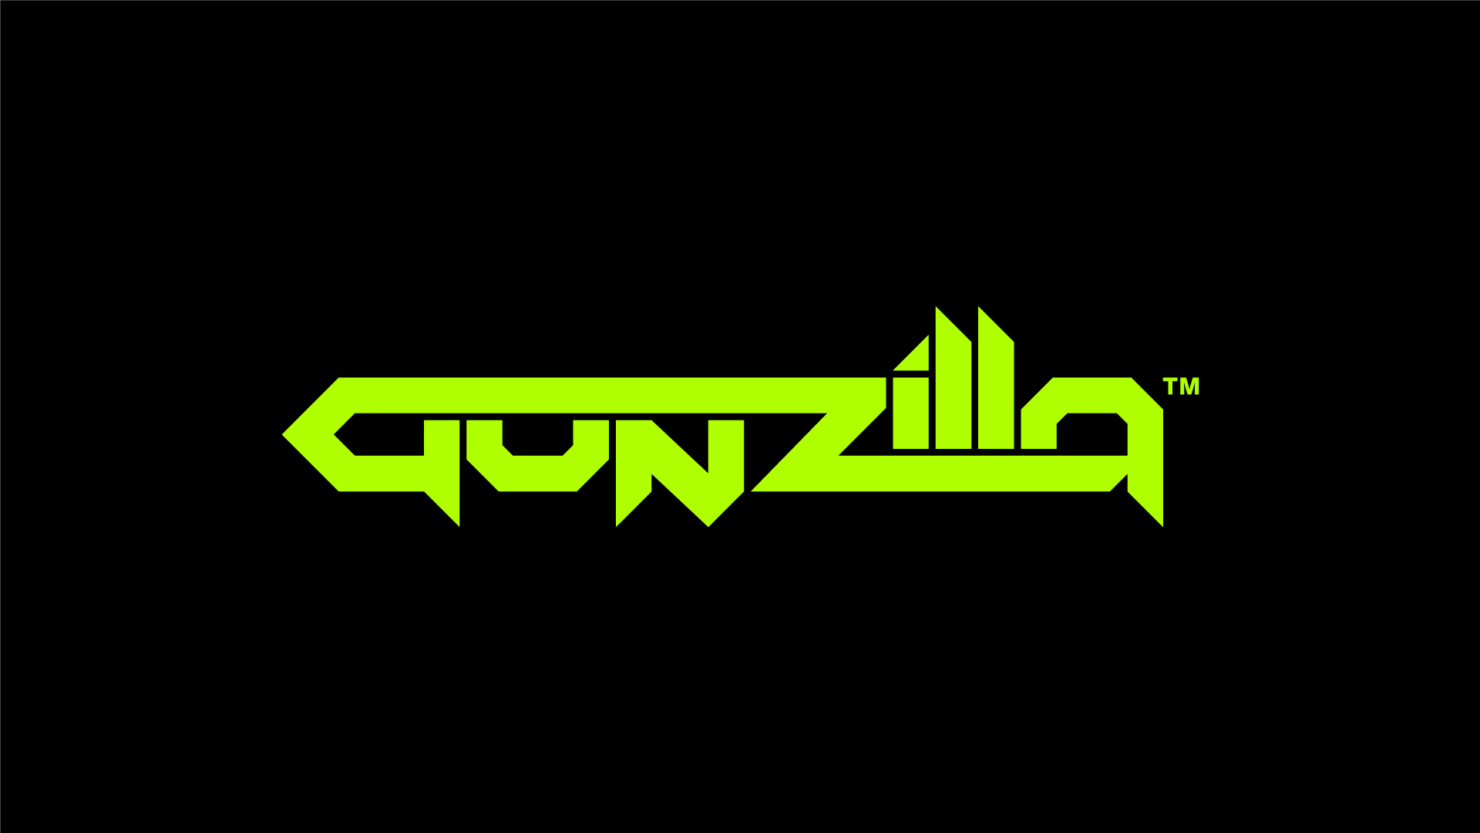 Gunzilla Games